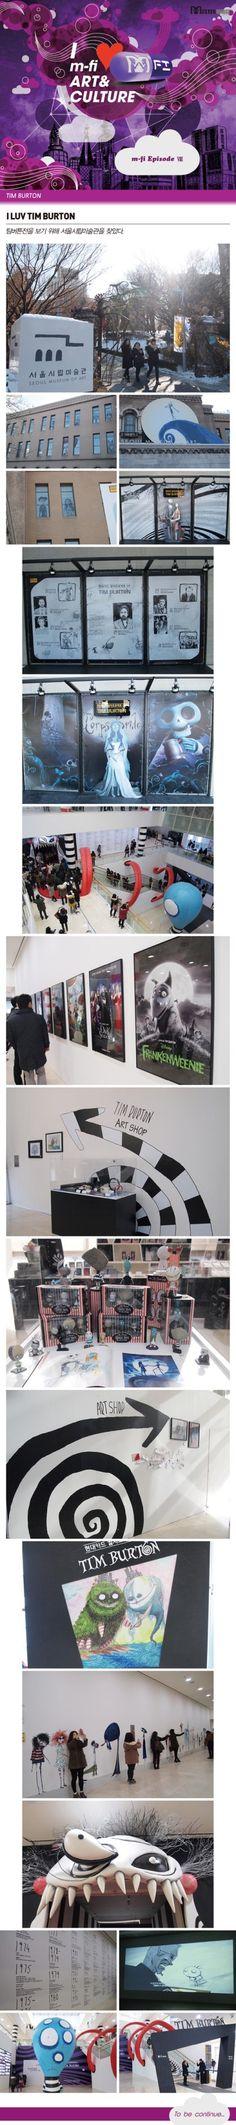 M-Fi《Episode》∥ Art & Culture // WORLD WIDE :: 팀버튼전(TIM BURTON) : 네이버 블로그